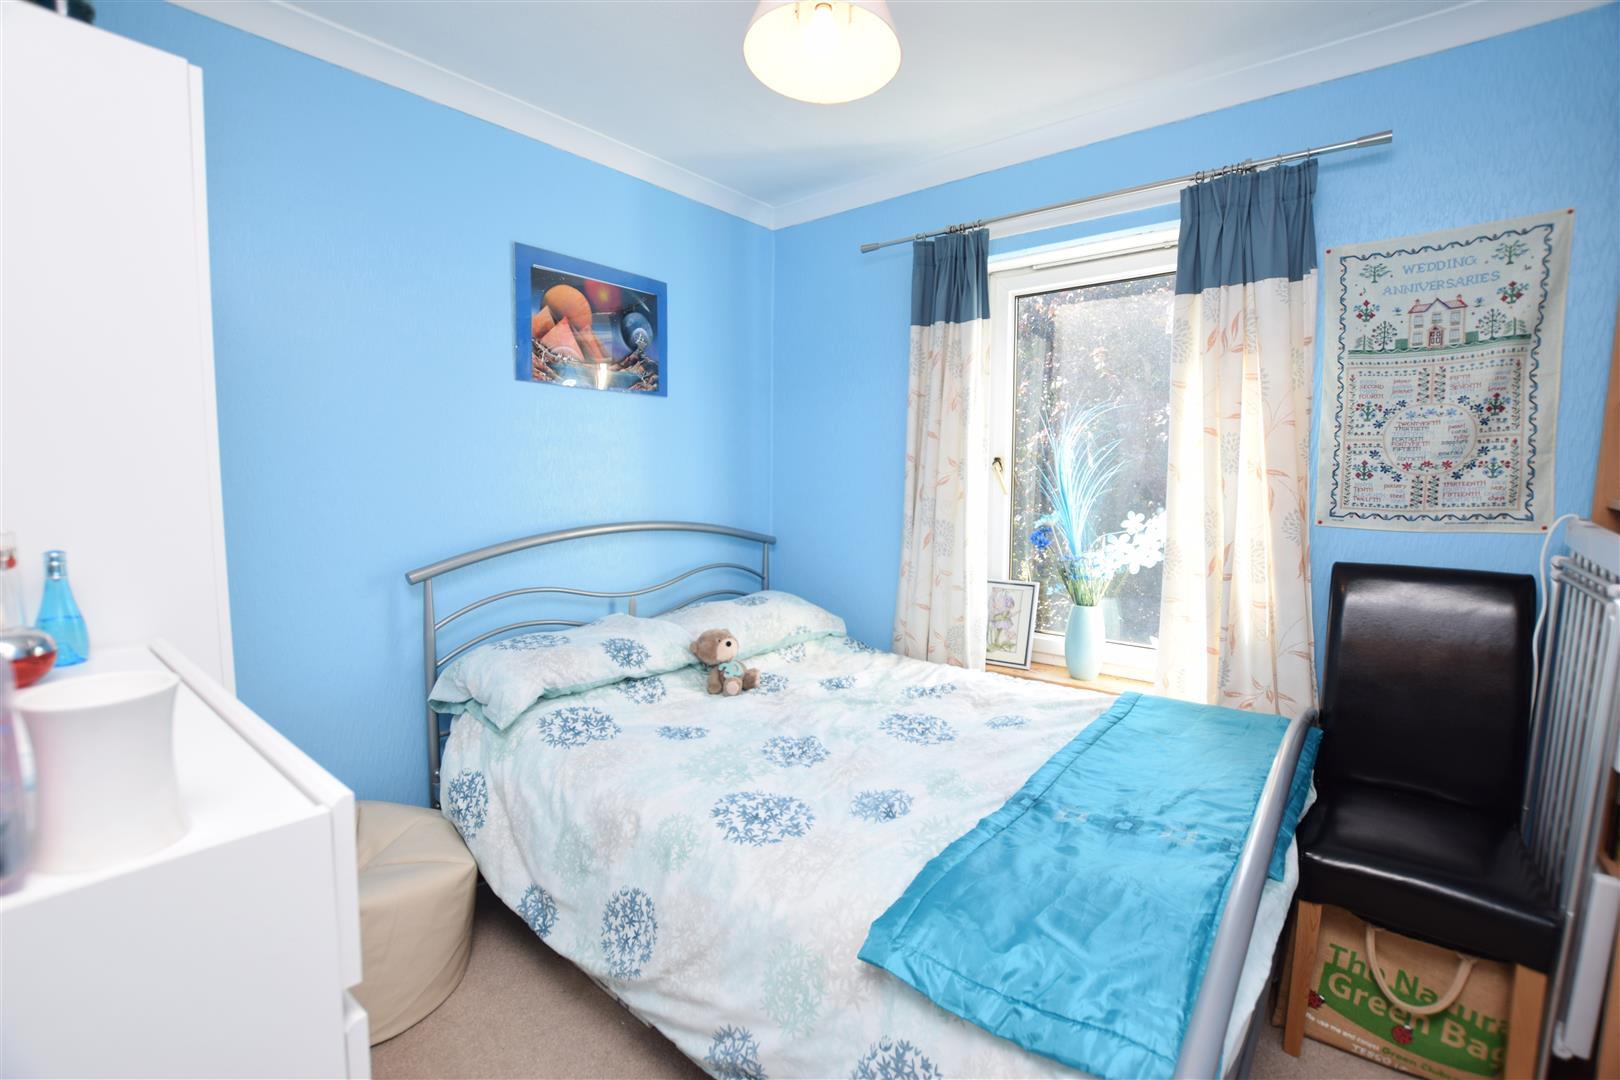 79, Potterhill Gardens, Perth, Perthshire, PH2 7ED, UK